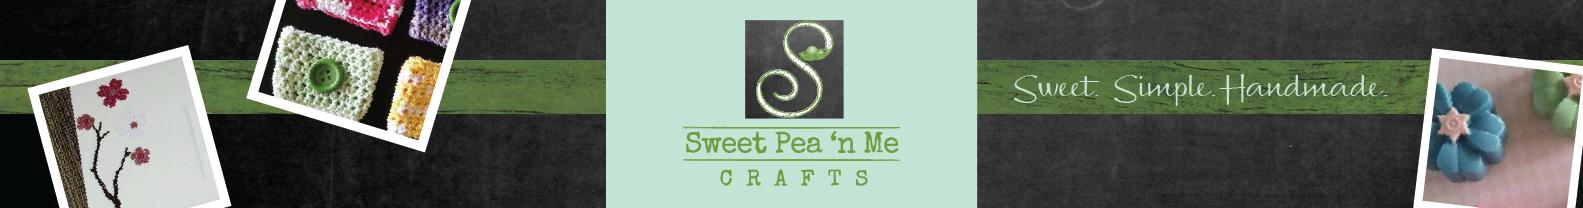 SweetPeaNMe-banner-03